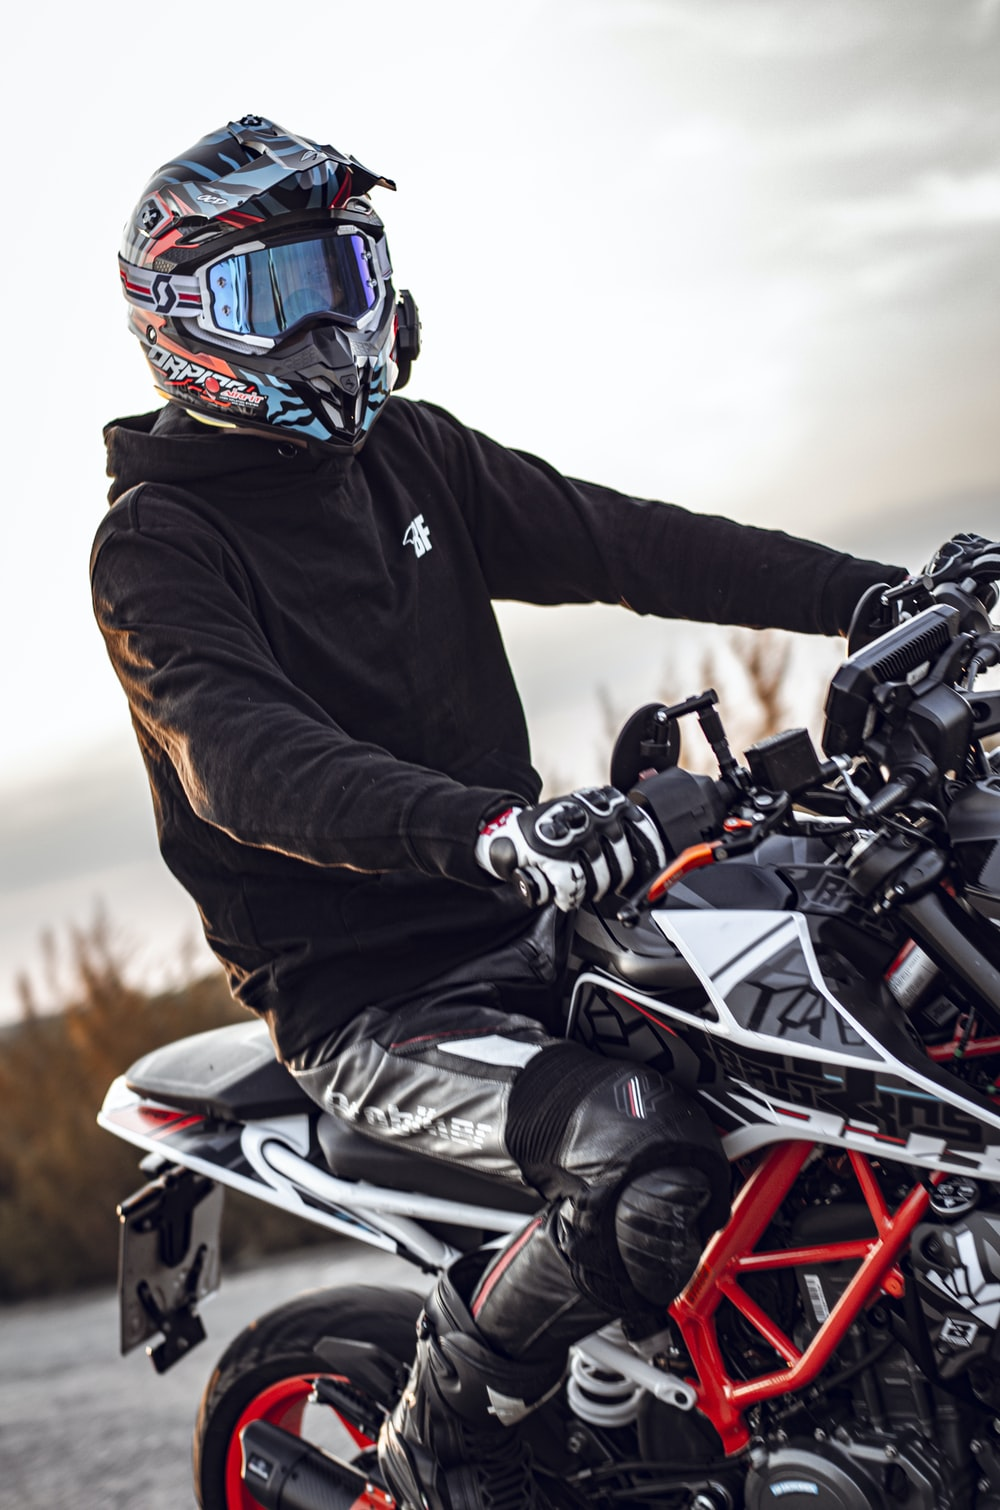 man in black jacket riding white and black sports bike